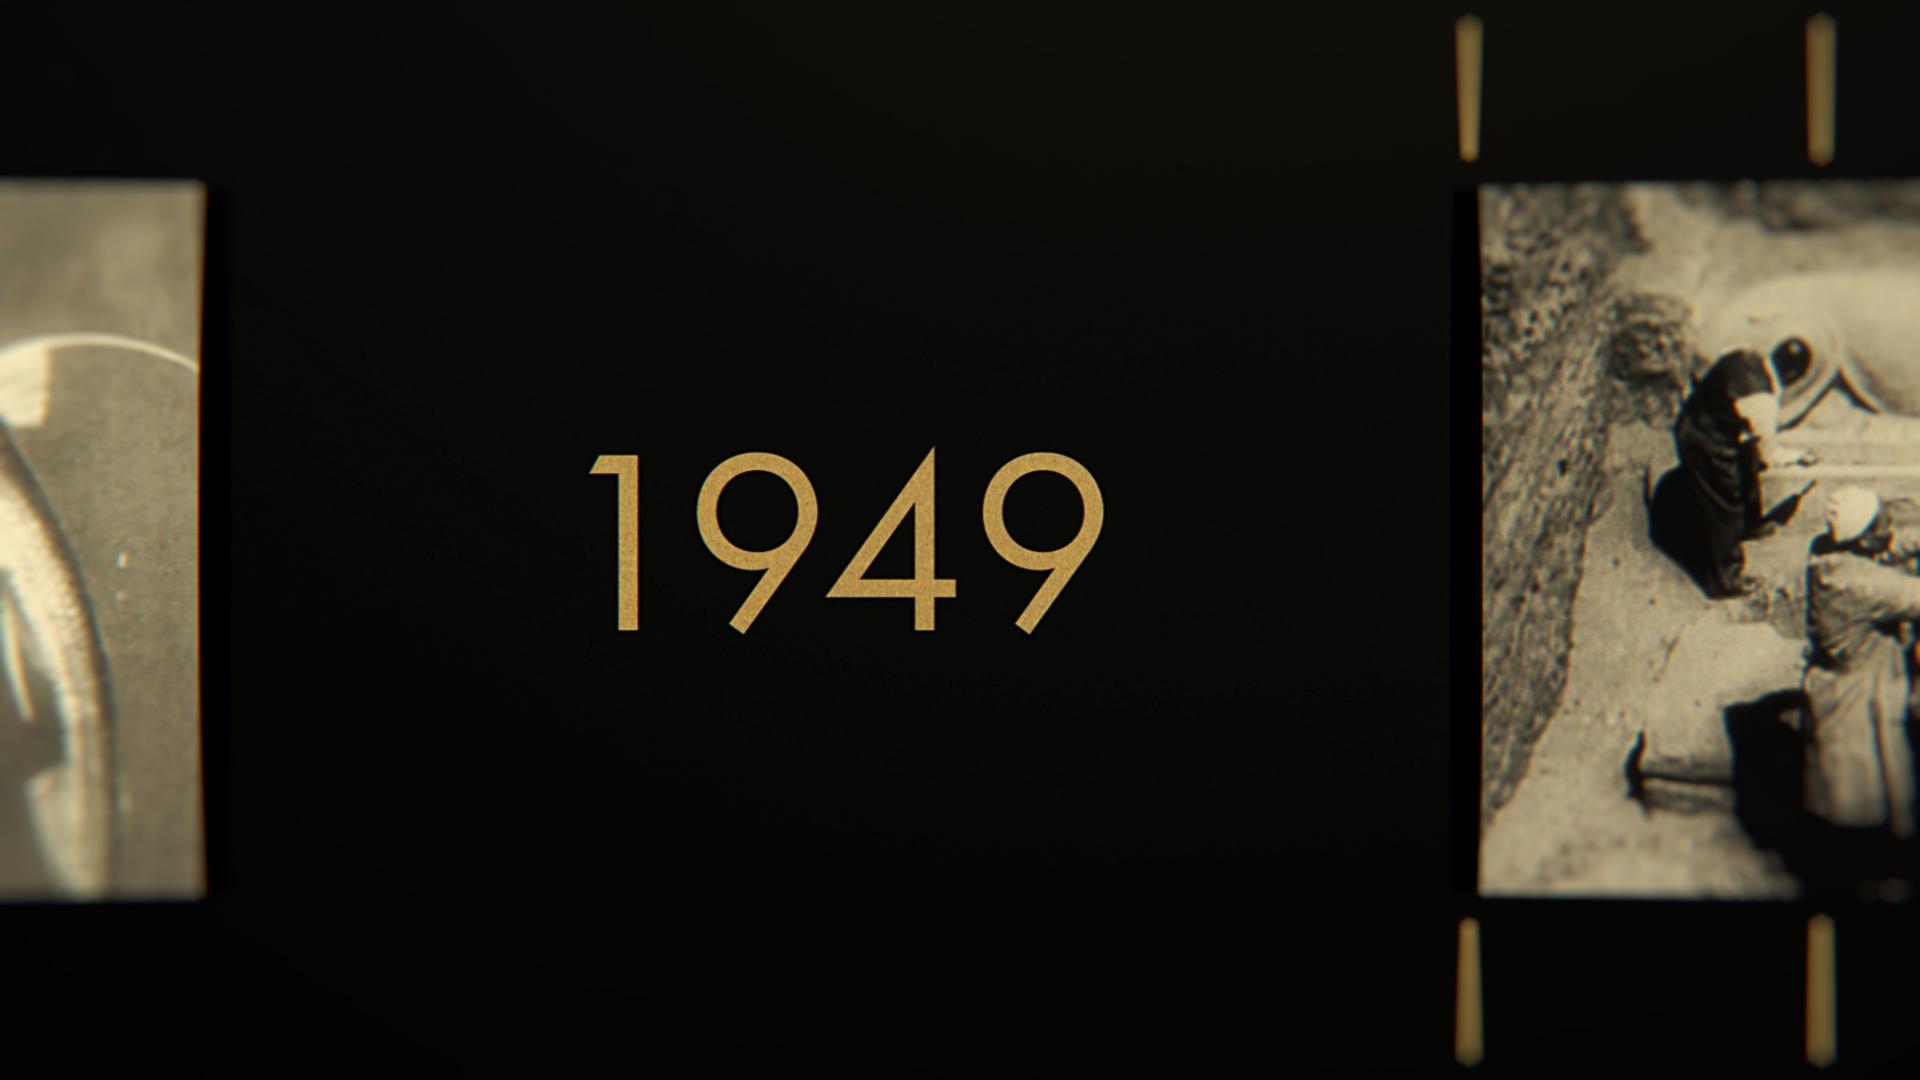 01_EXP_TL_01_1928-1949_FINAL_ProRes4444 (10-17-11-10).jpg